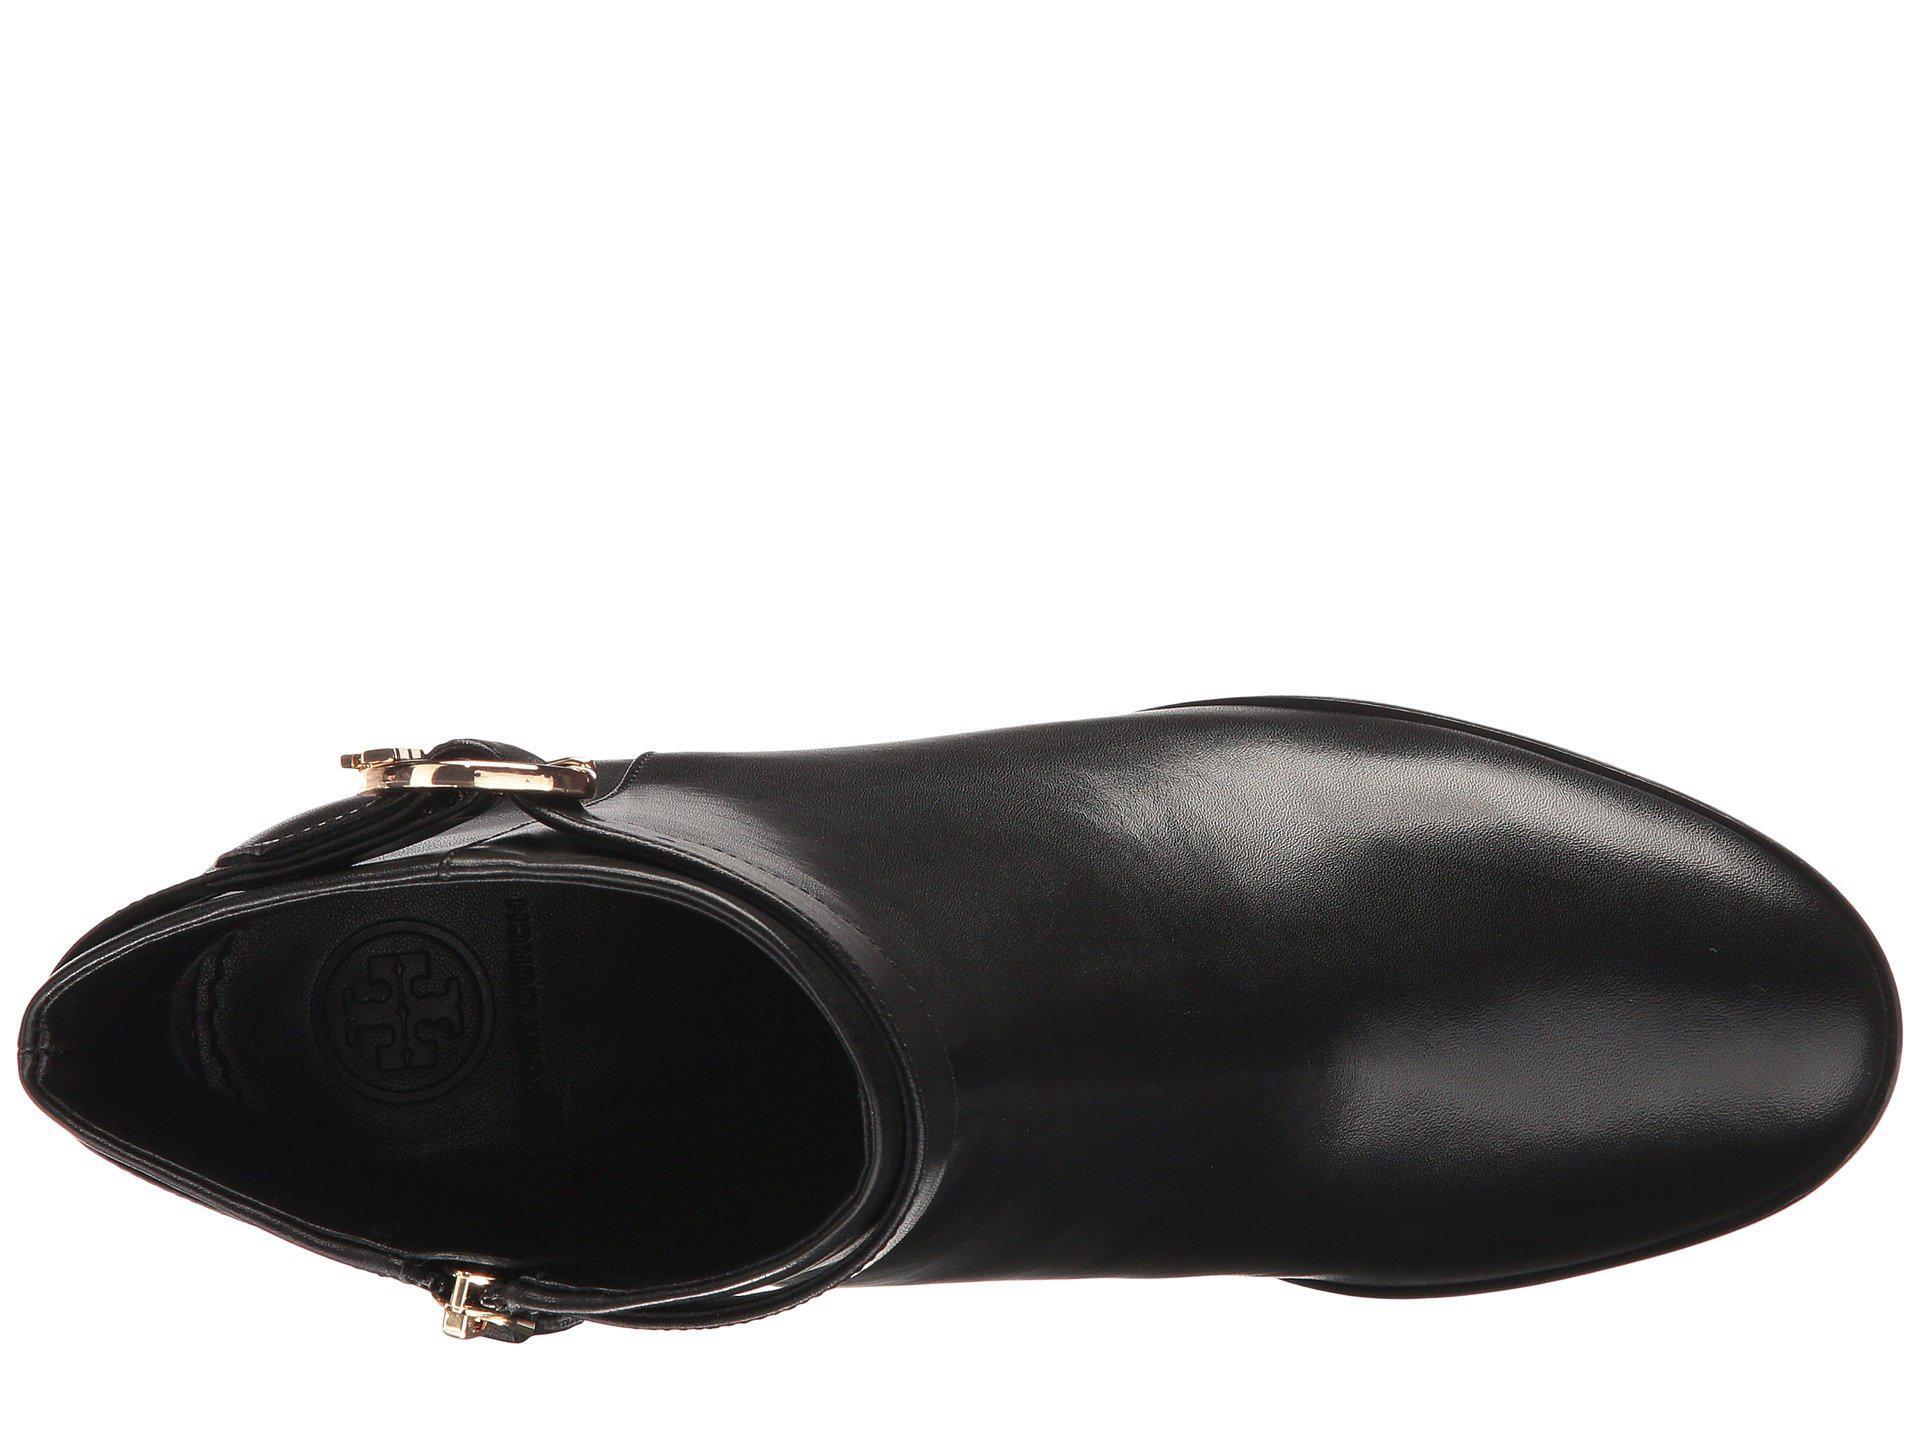 e20ac249eb7 Lyst - Tory Burch Sofia 60mm Dress Bootie in Black